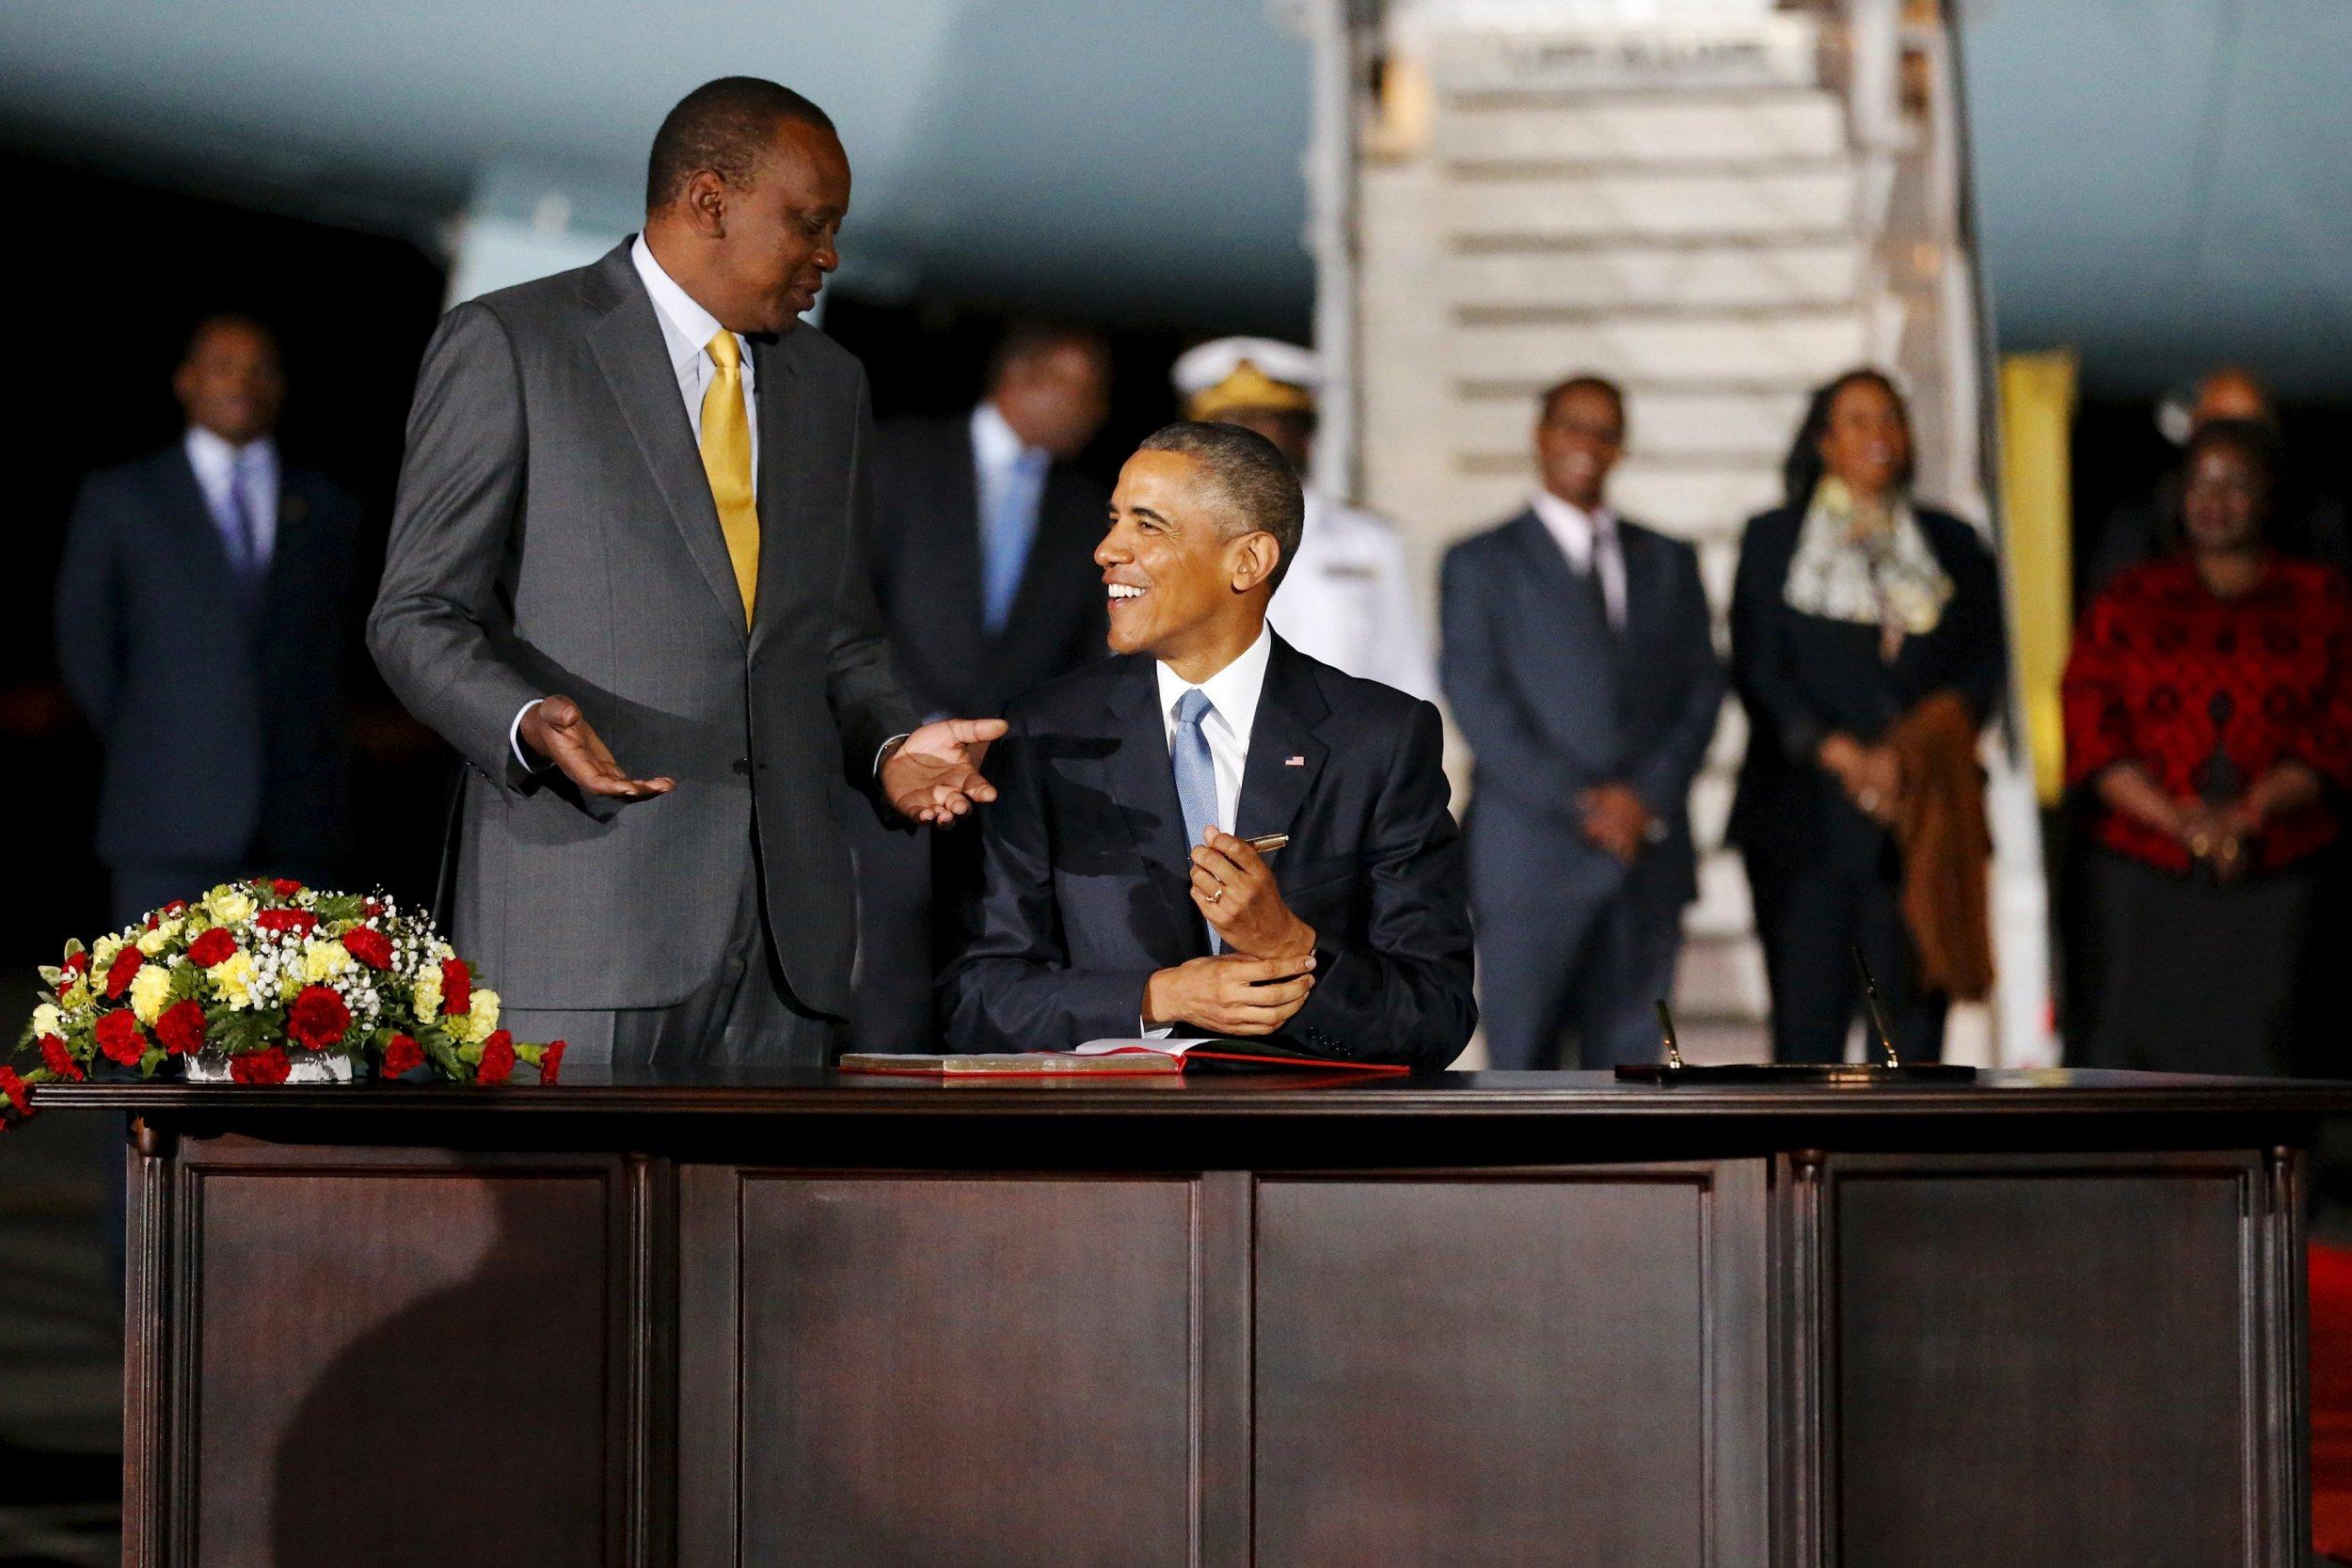 2015-07-24T175542Z_96743368_GF10000169096_RTRMADP_3_OBAMA-AFRICA-KENYA